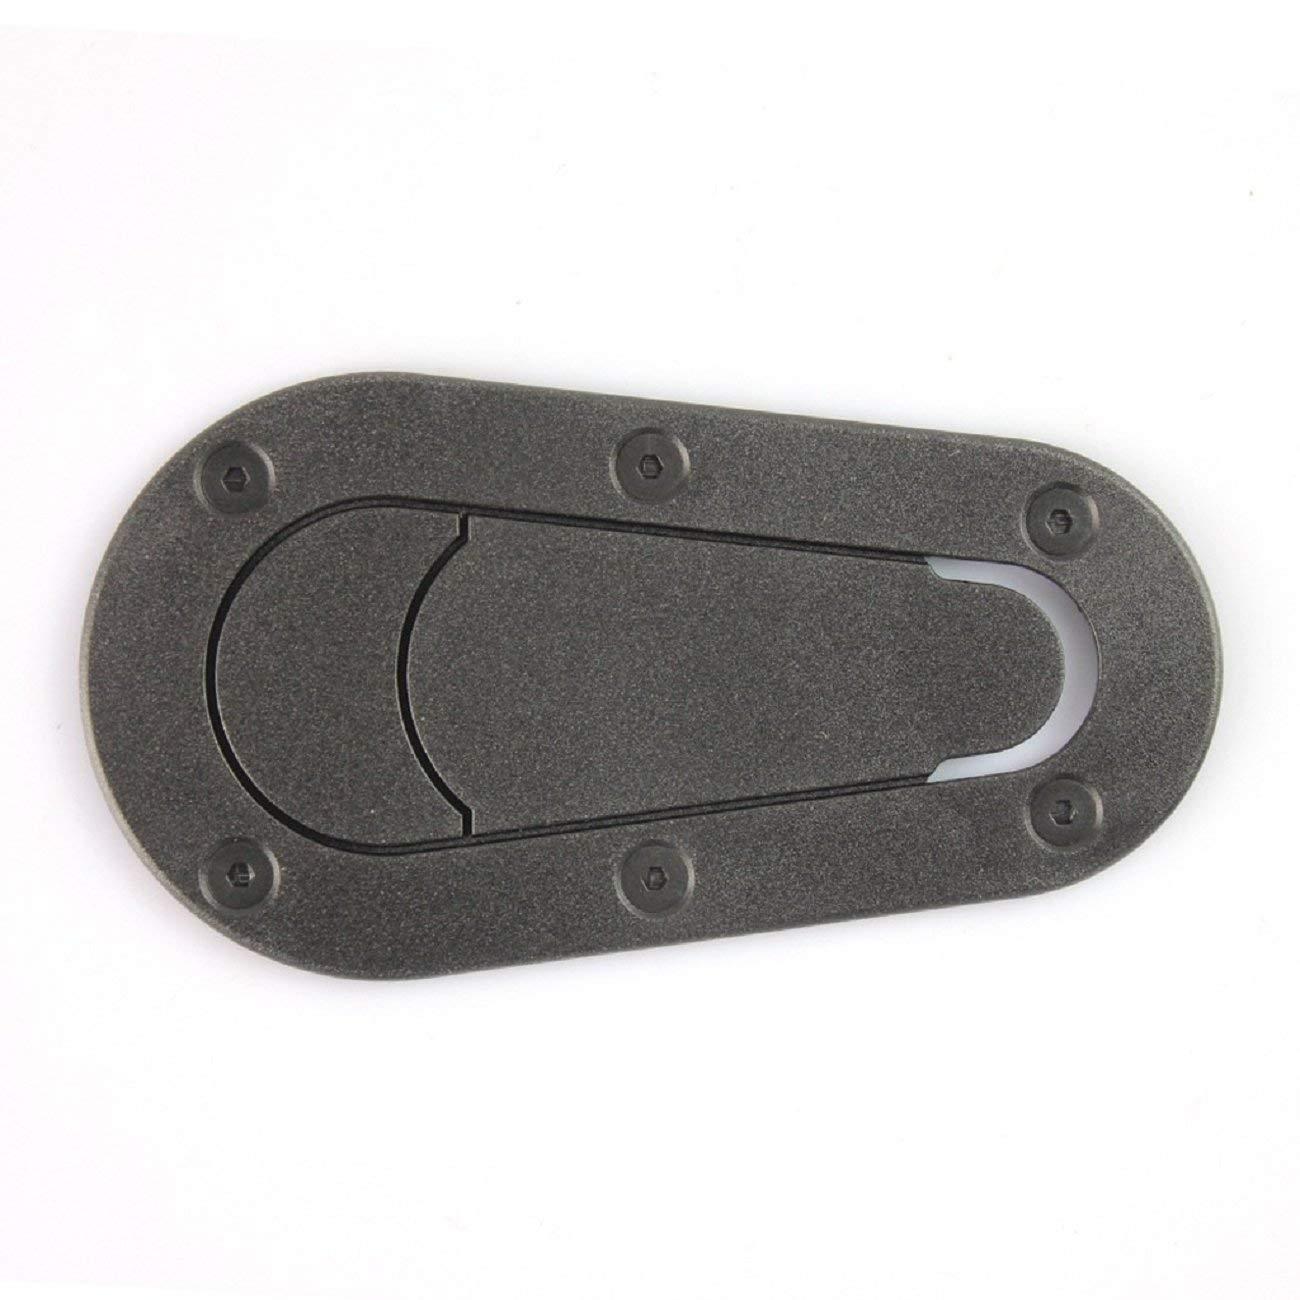 Putars Car Exterior Accessories Engine Sticker Auto Parts General Car Waterproof Protection(Matte Black Black Carbon) Auto Adhesive Trim Machine Cover Lock Engine Trim Sticker